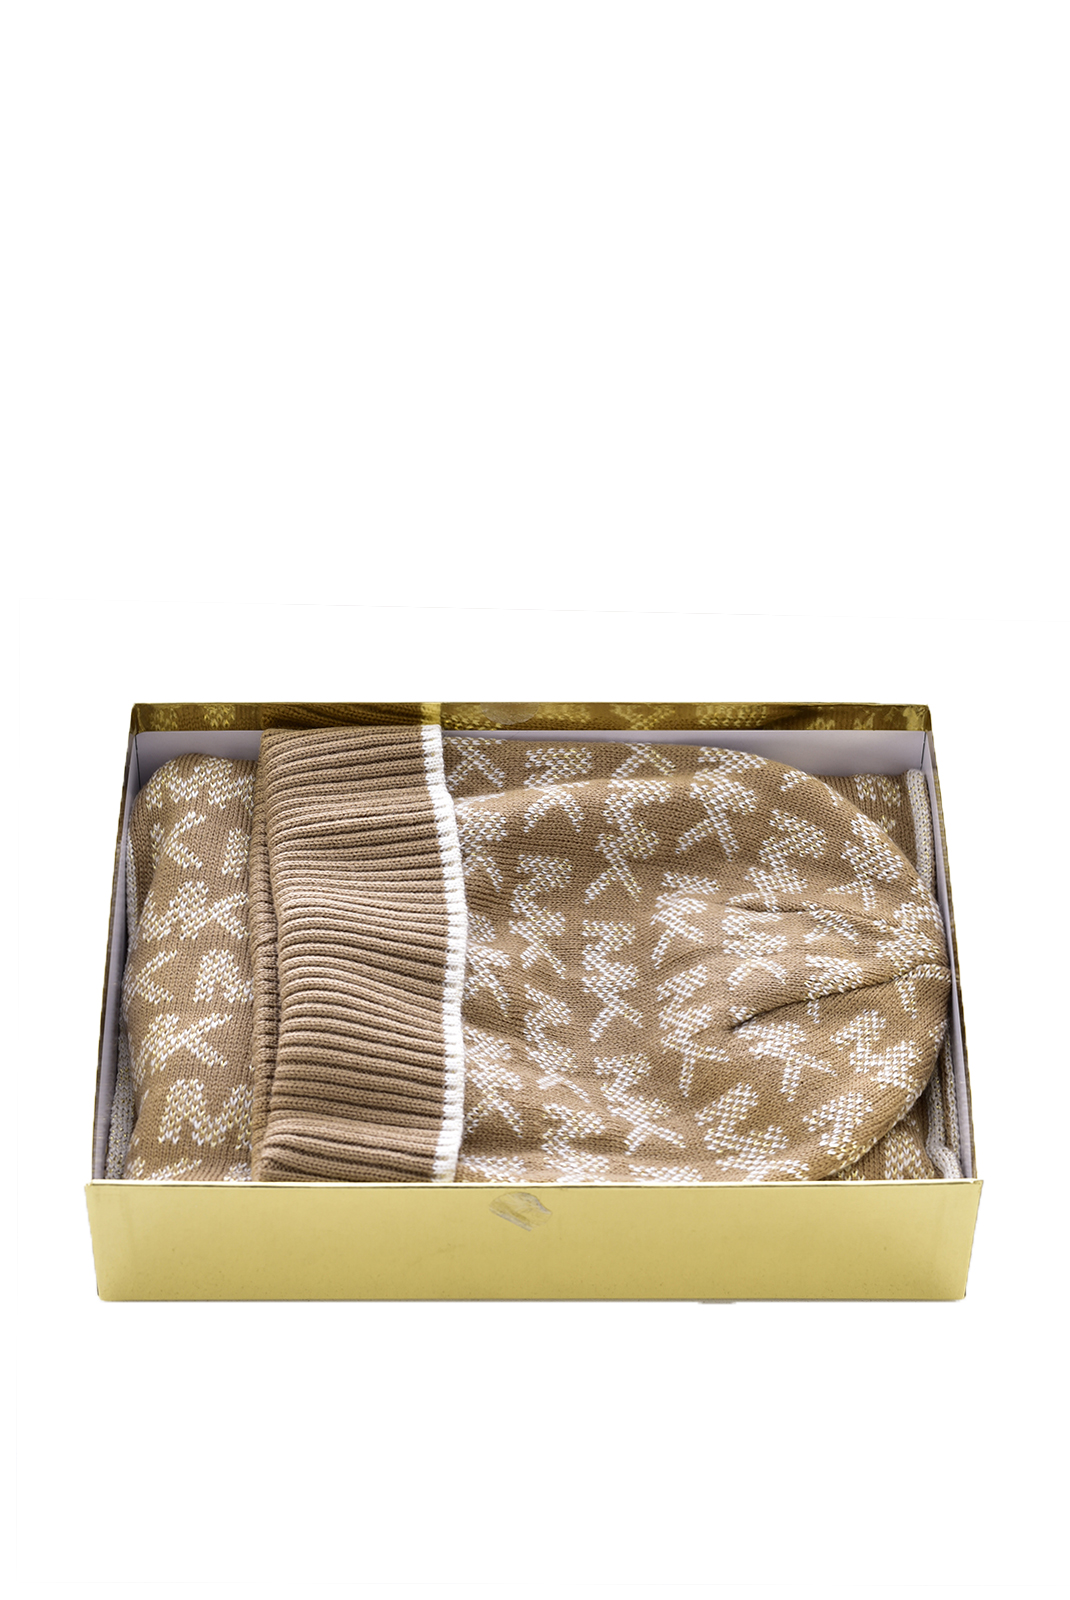 Echarpe, Foulard  Michael Kors 538163 DARK CAMEL GOLD